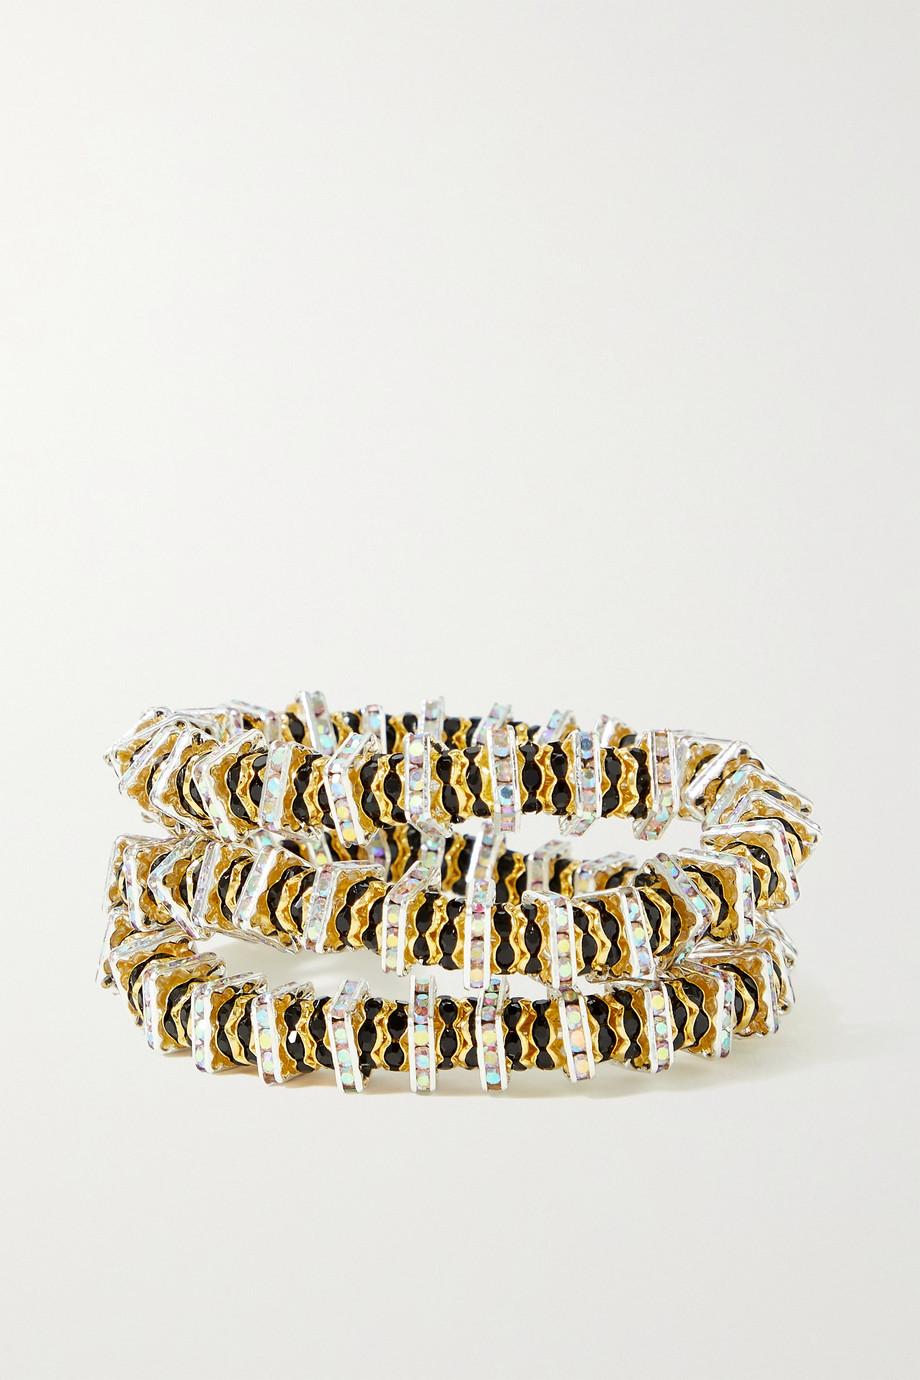 PEARL OCTOPUSS.Y Bracelet en plaqué or et cristaux Rattlesnake